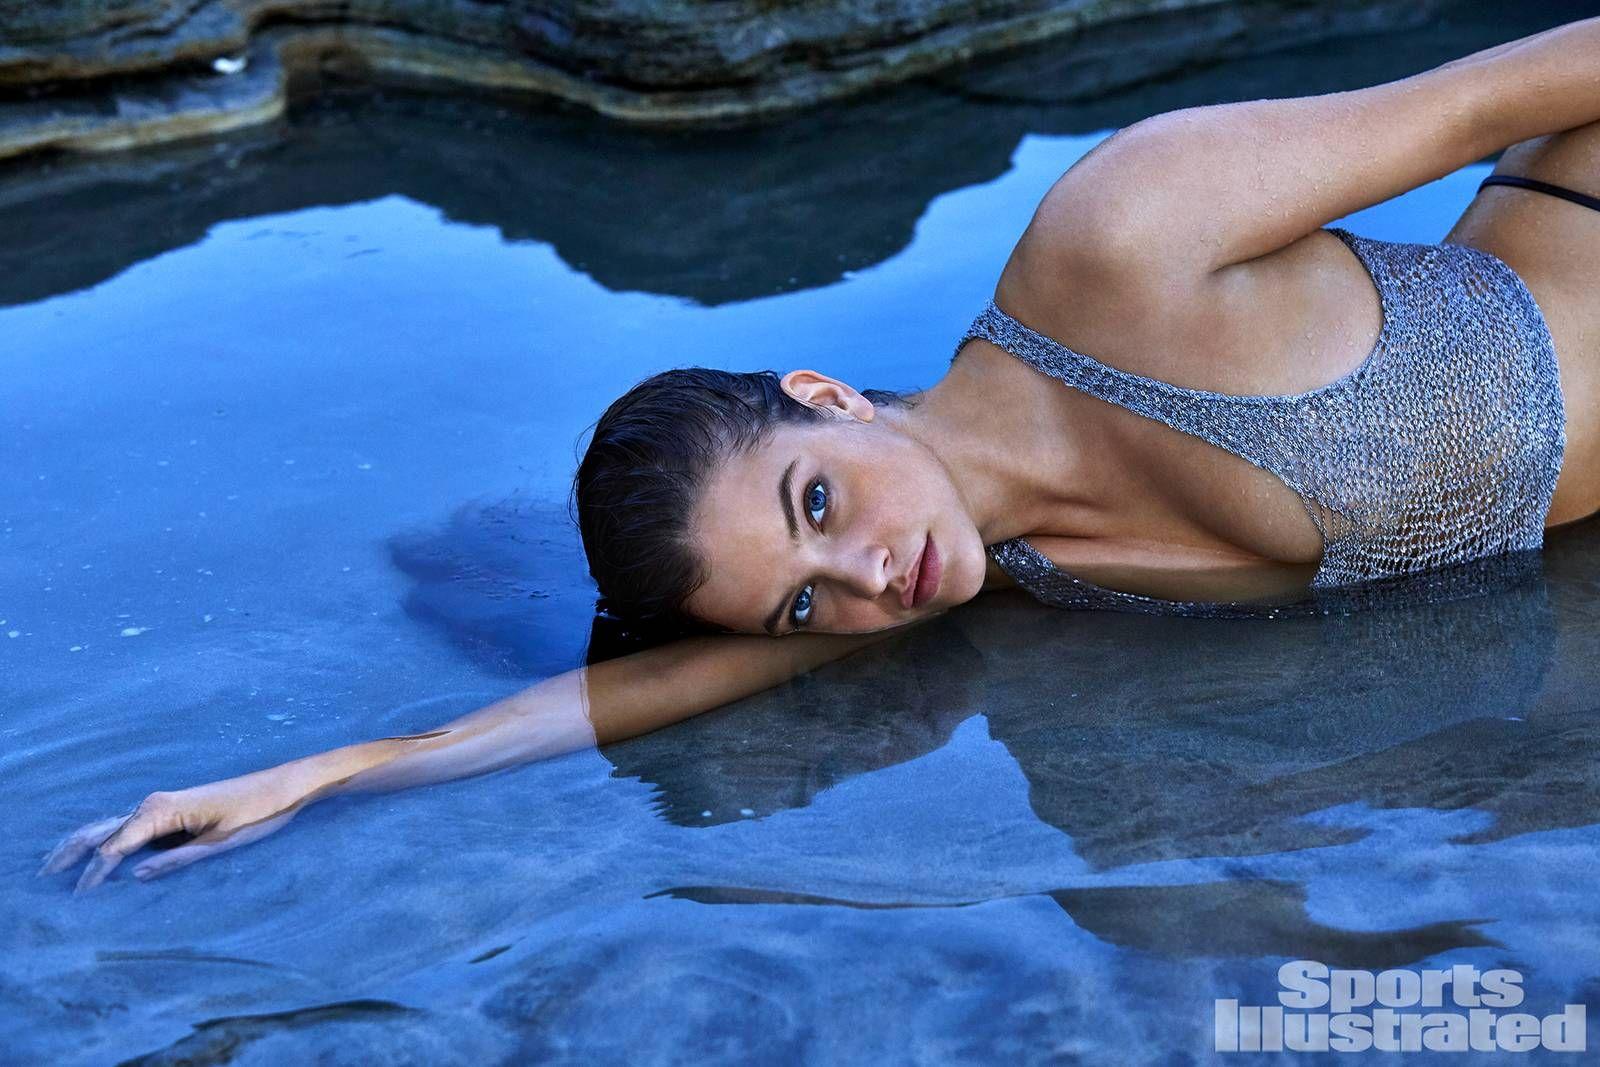 Barbara Palvin Si Swimsuit 2019 By James Macari